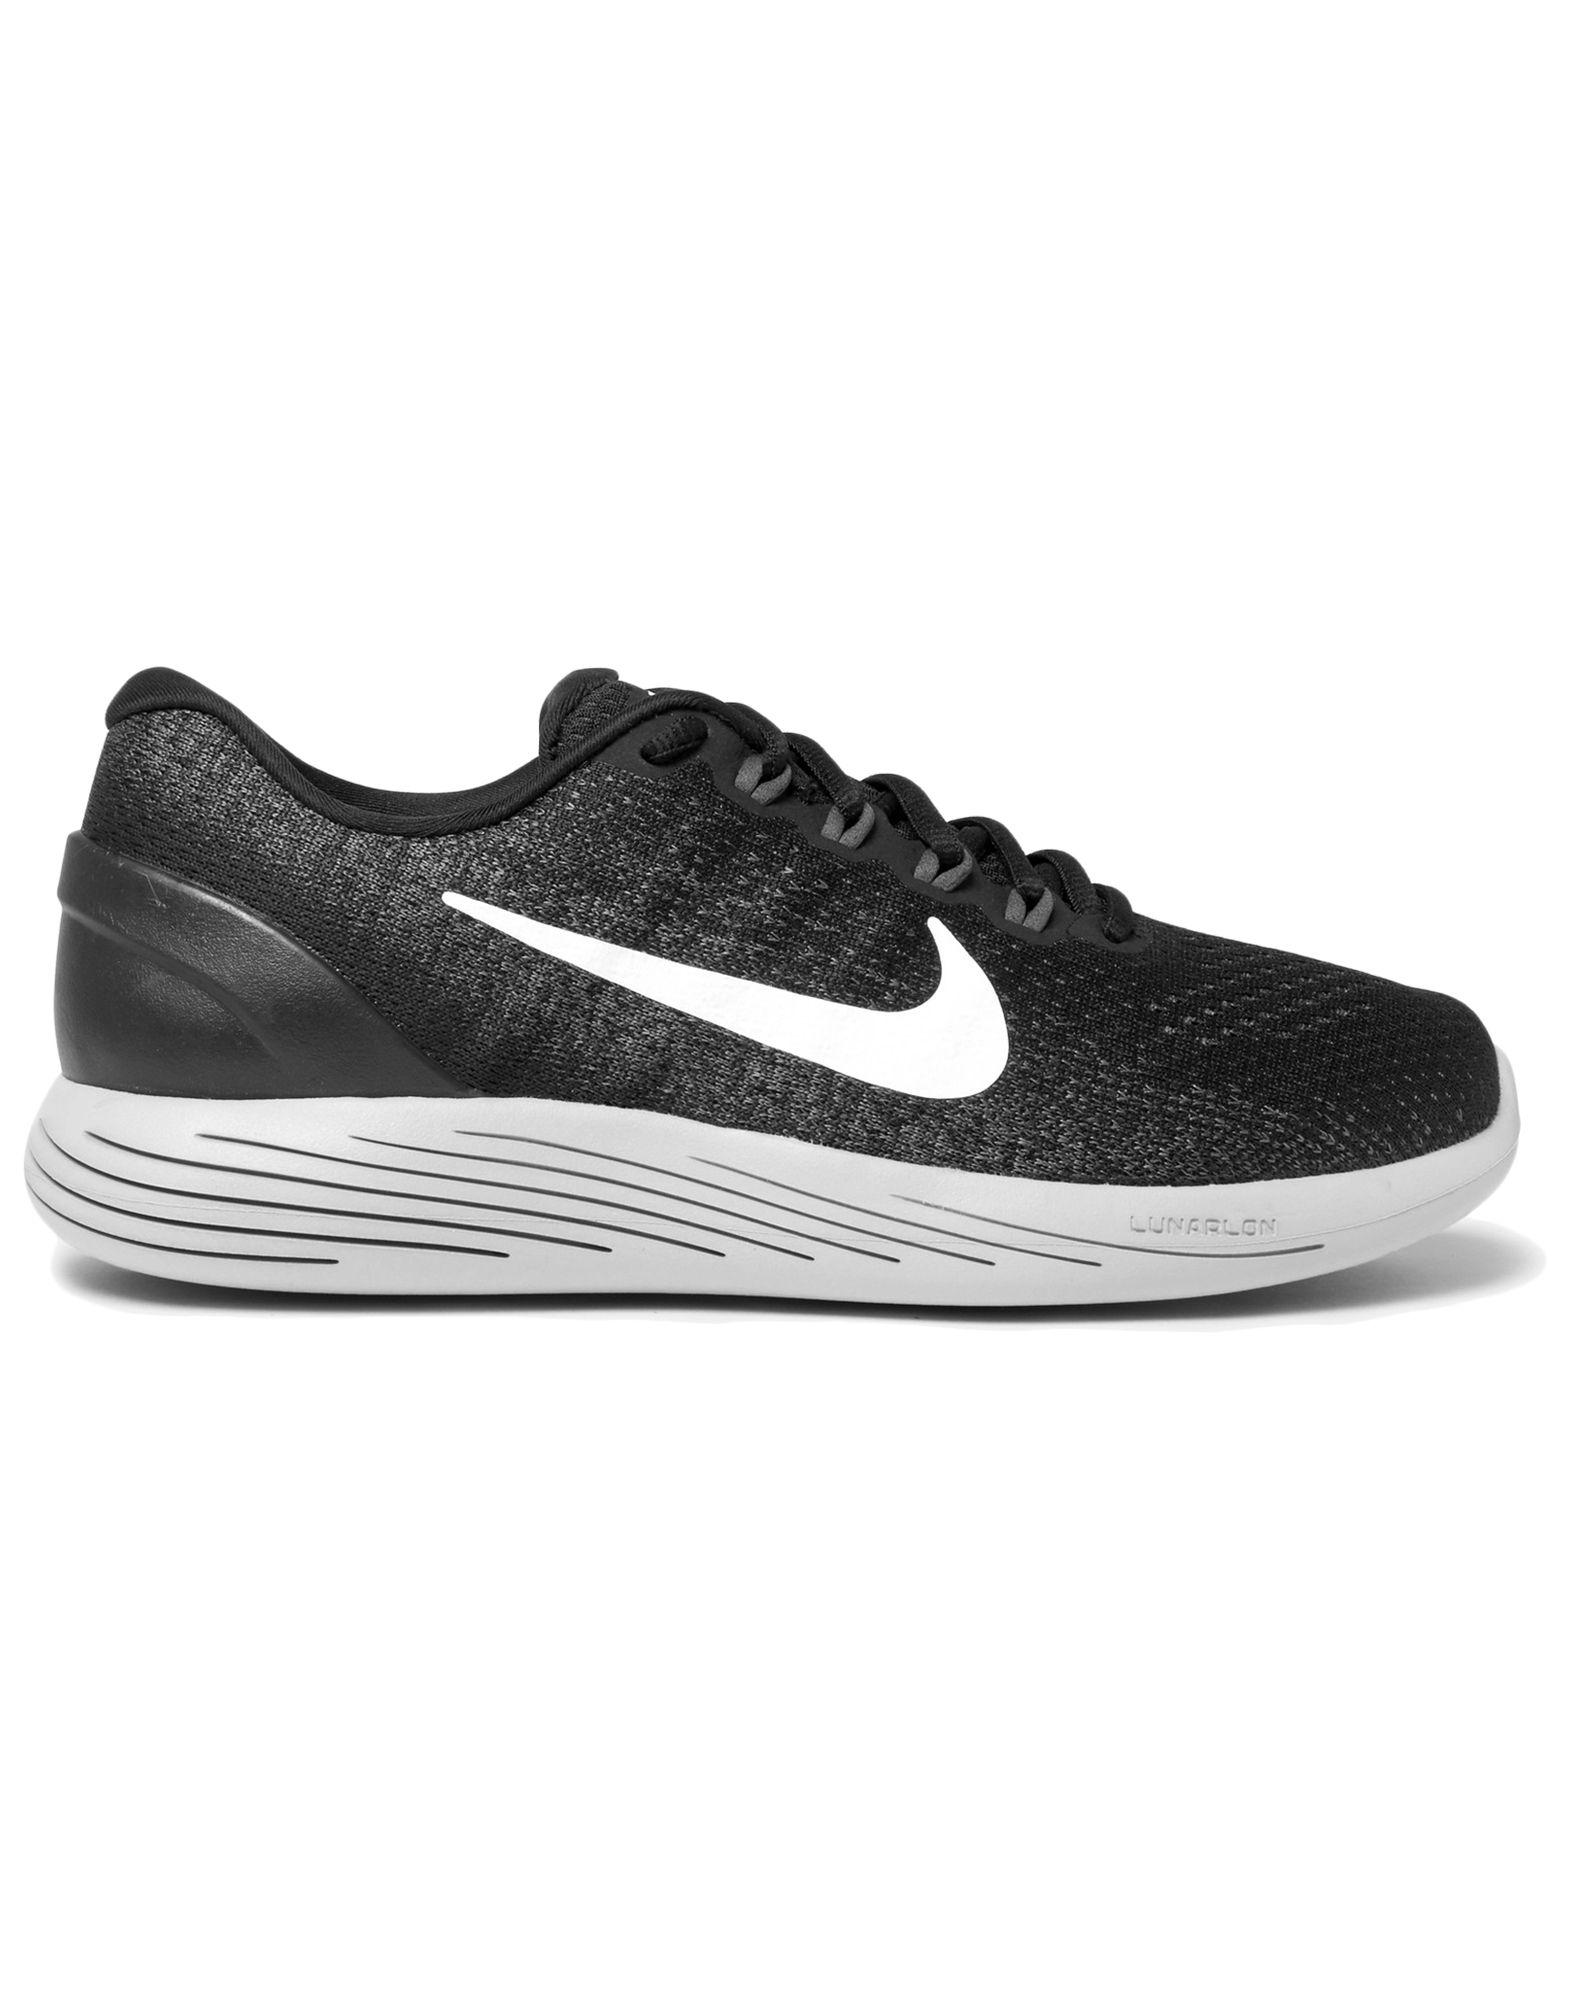 Moda Sneakers Nike Nike Sneakers Uomo - 11540945KS cfb197